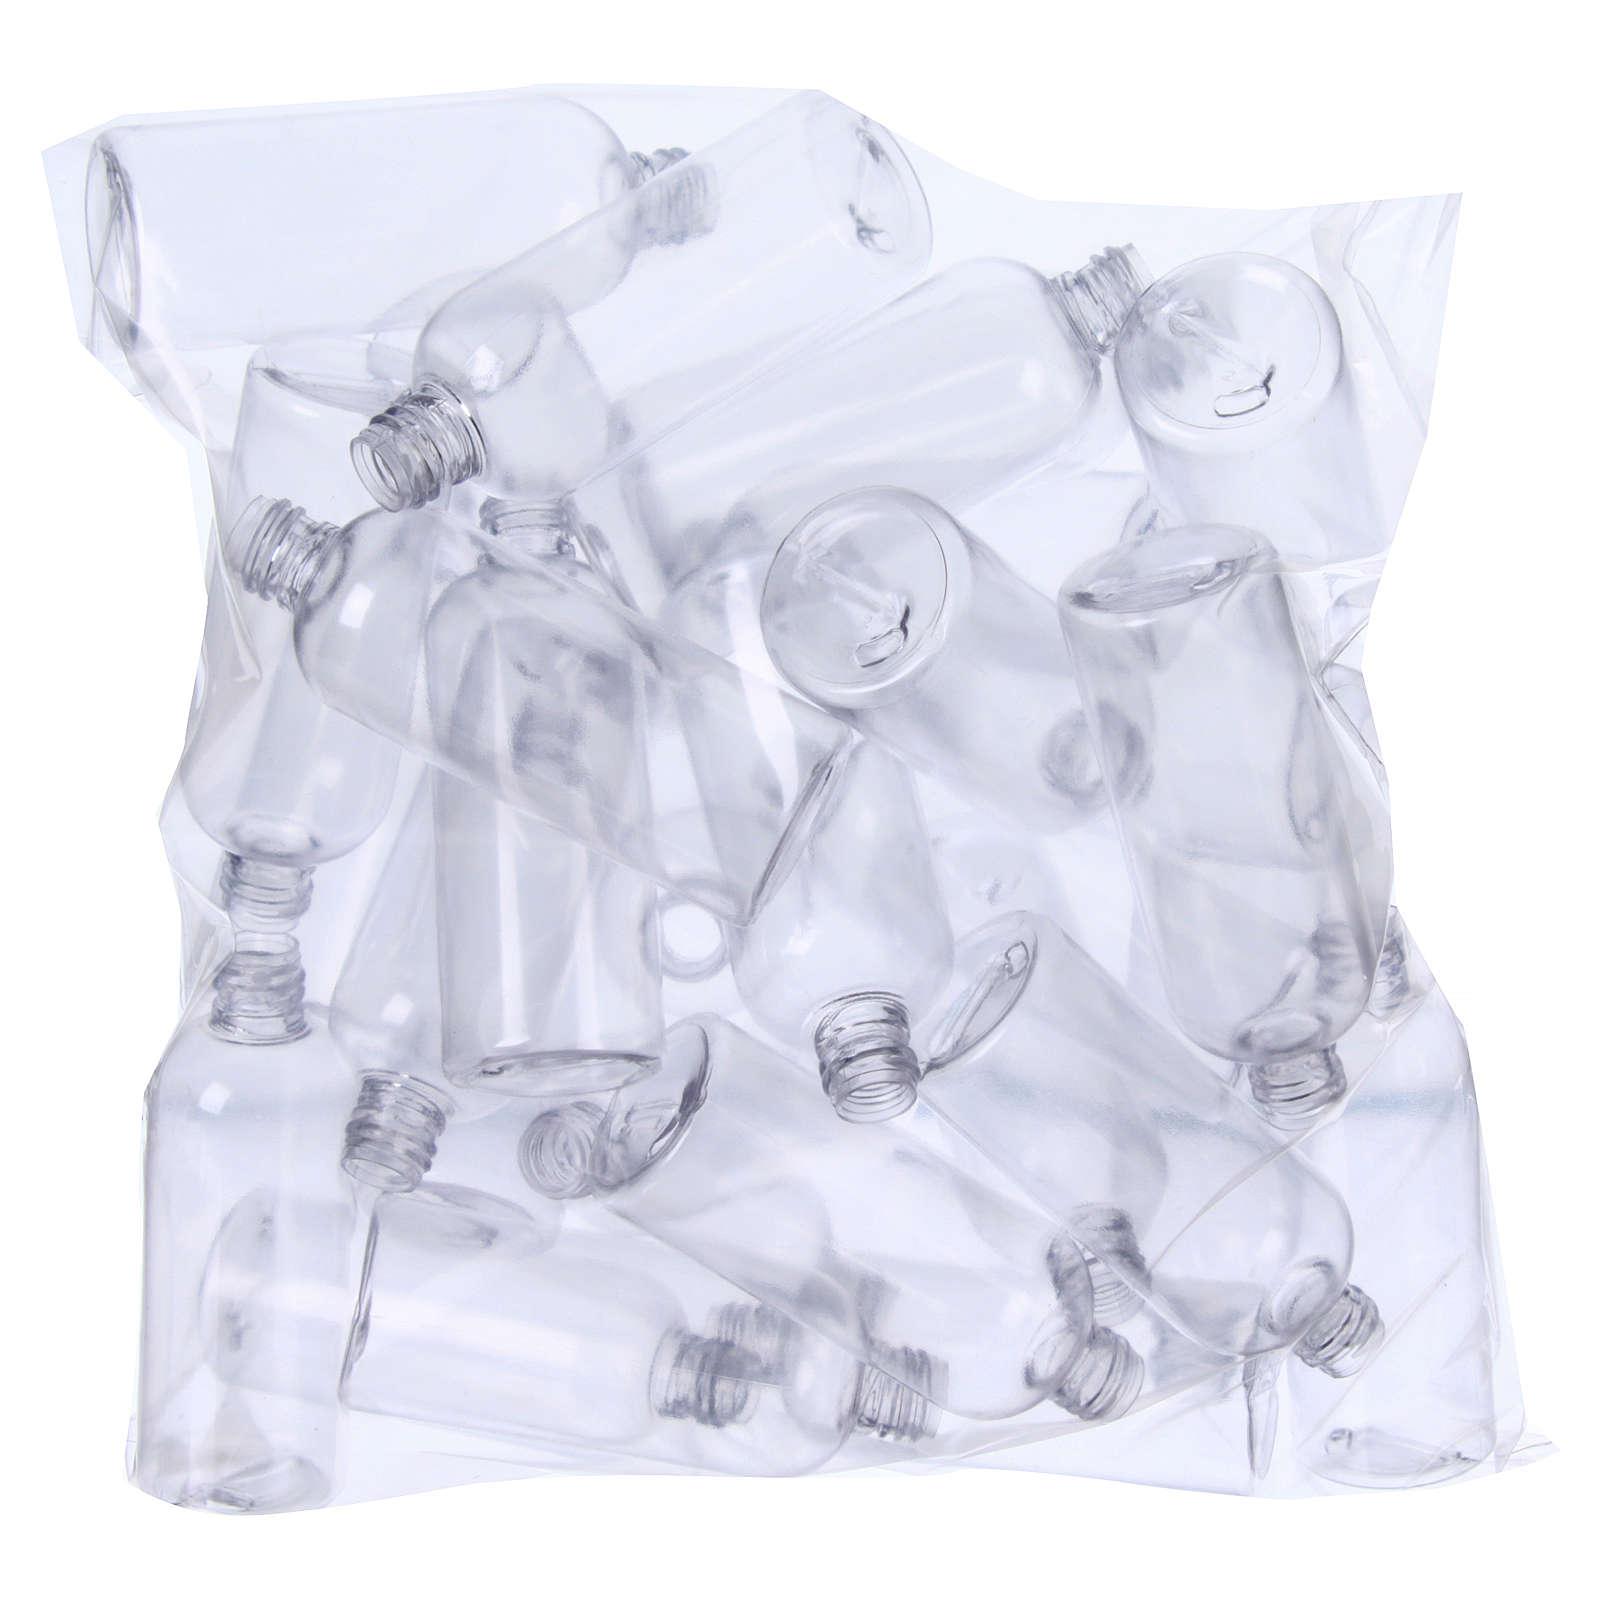 Botellas agua bendita 100 ml cilíndrica 100 piezas 3